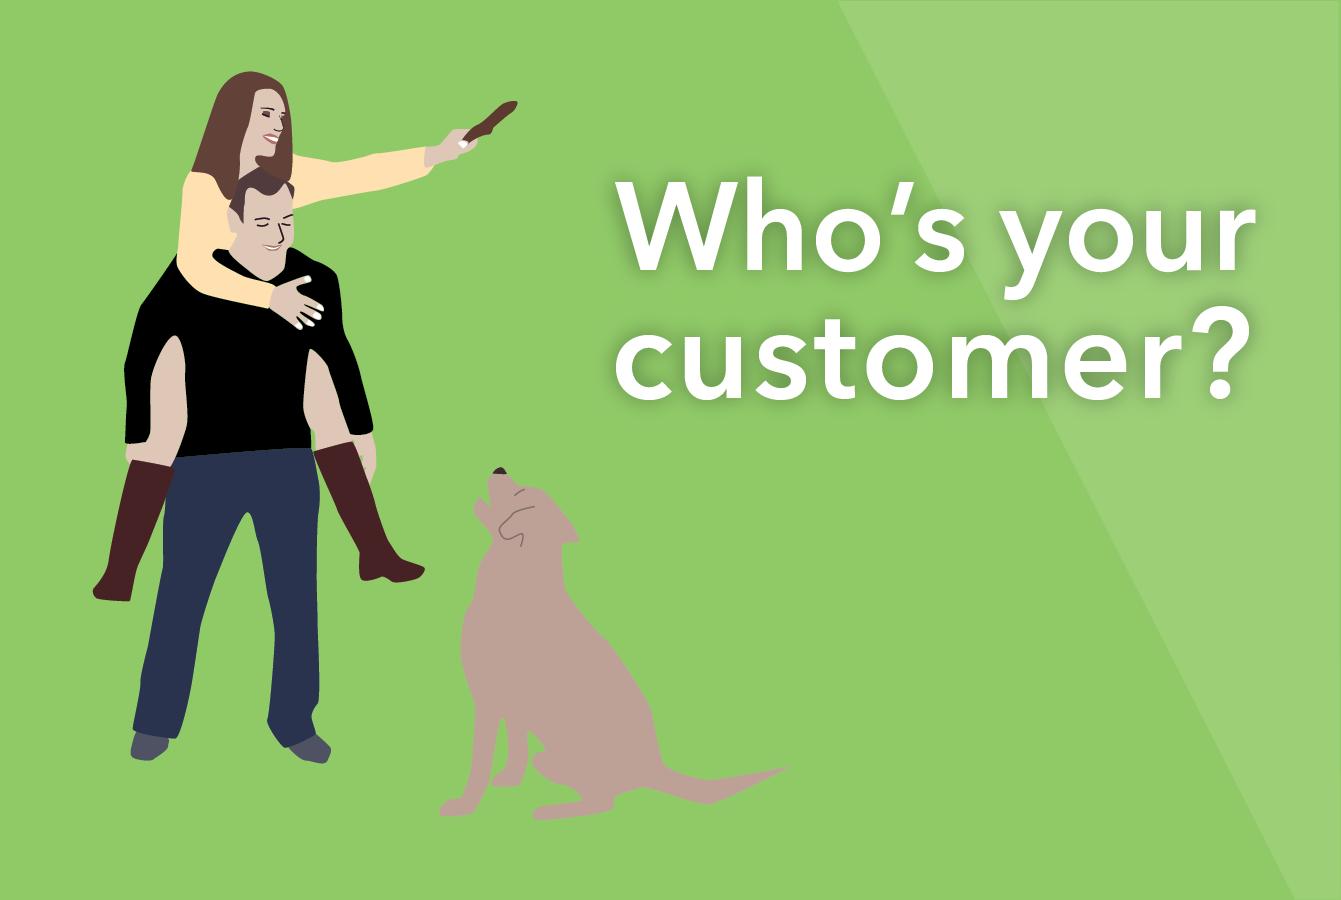 pet-business-marketing-guide-pet-product-marketing-plan-target-market